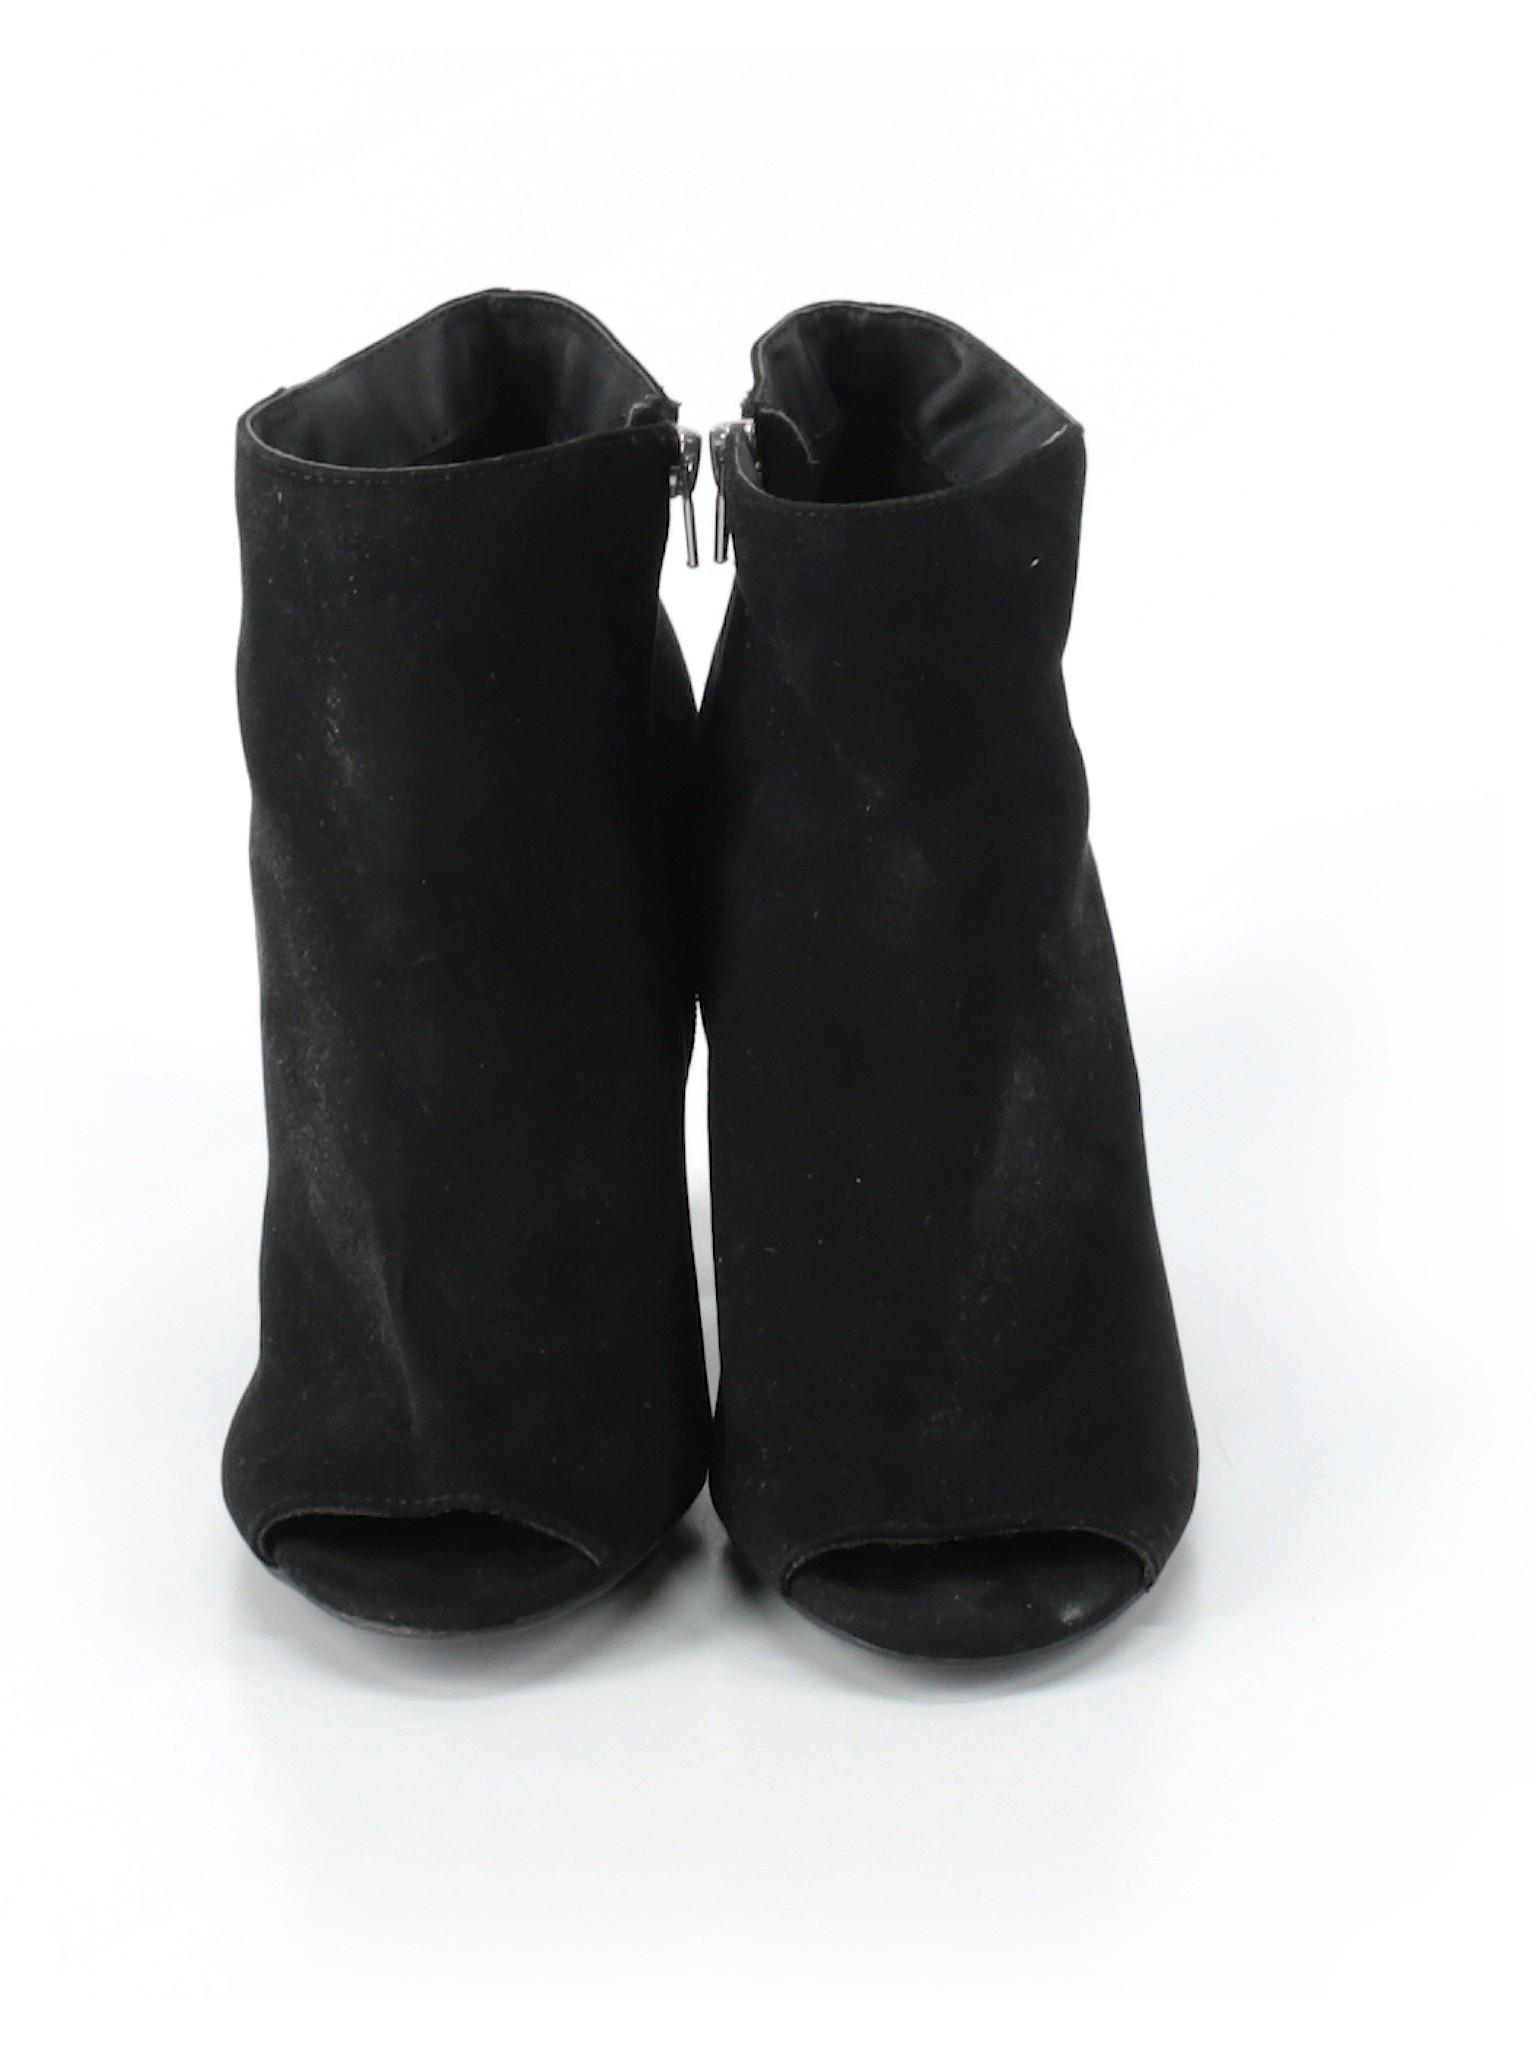 Boutique Heels Boutique Merona promotion Merona Heels promotion 8wqfgB5